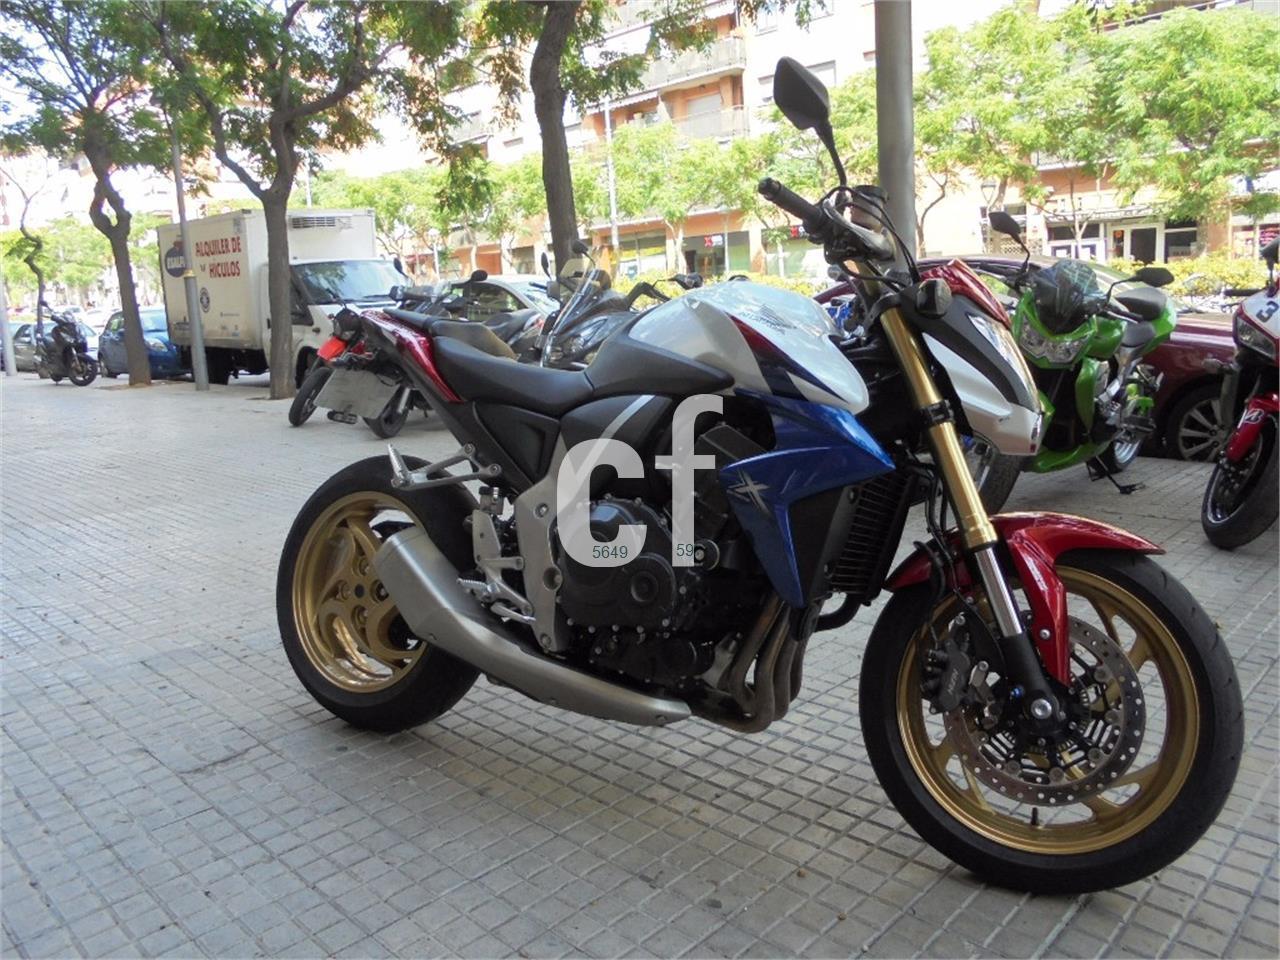 HONDA CB 1000R ABS Tricolor Mat Cynos Gris 3 De Venta En Tarragona